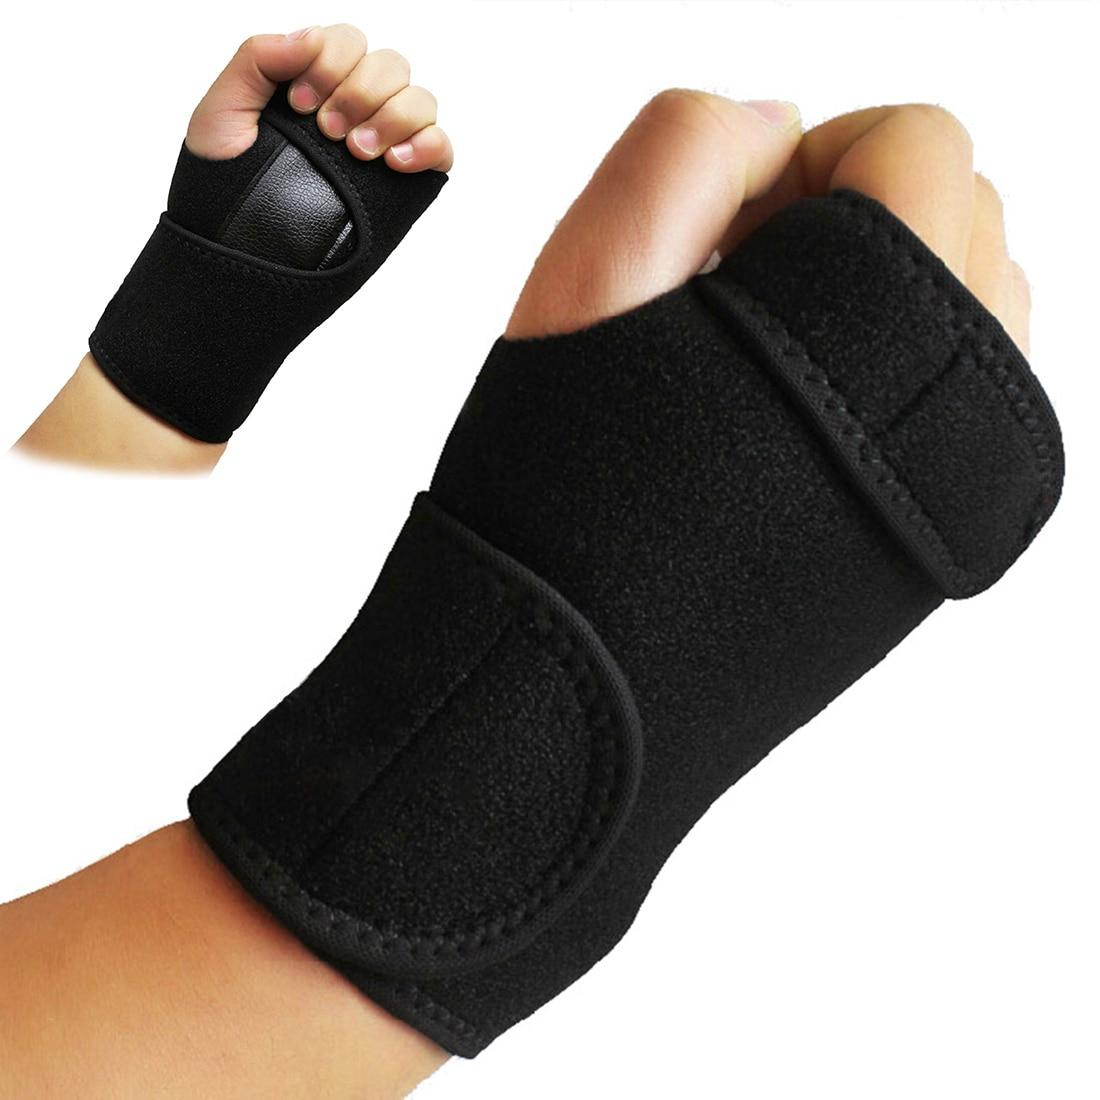 High Quality Wristband New Bandage Orthopedic Hand Brace Wrist Support Finger Splint Carpal Tunnel Syndrome eldiven